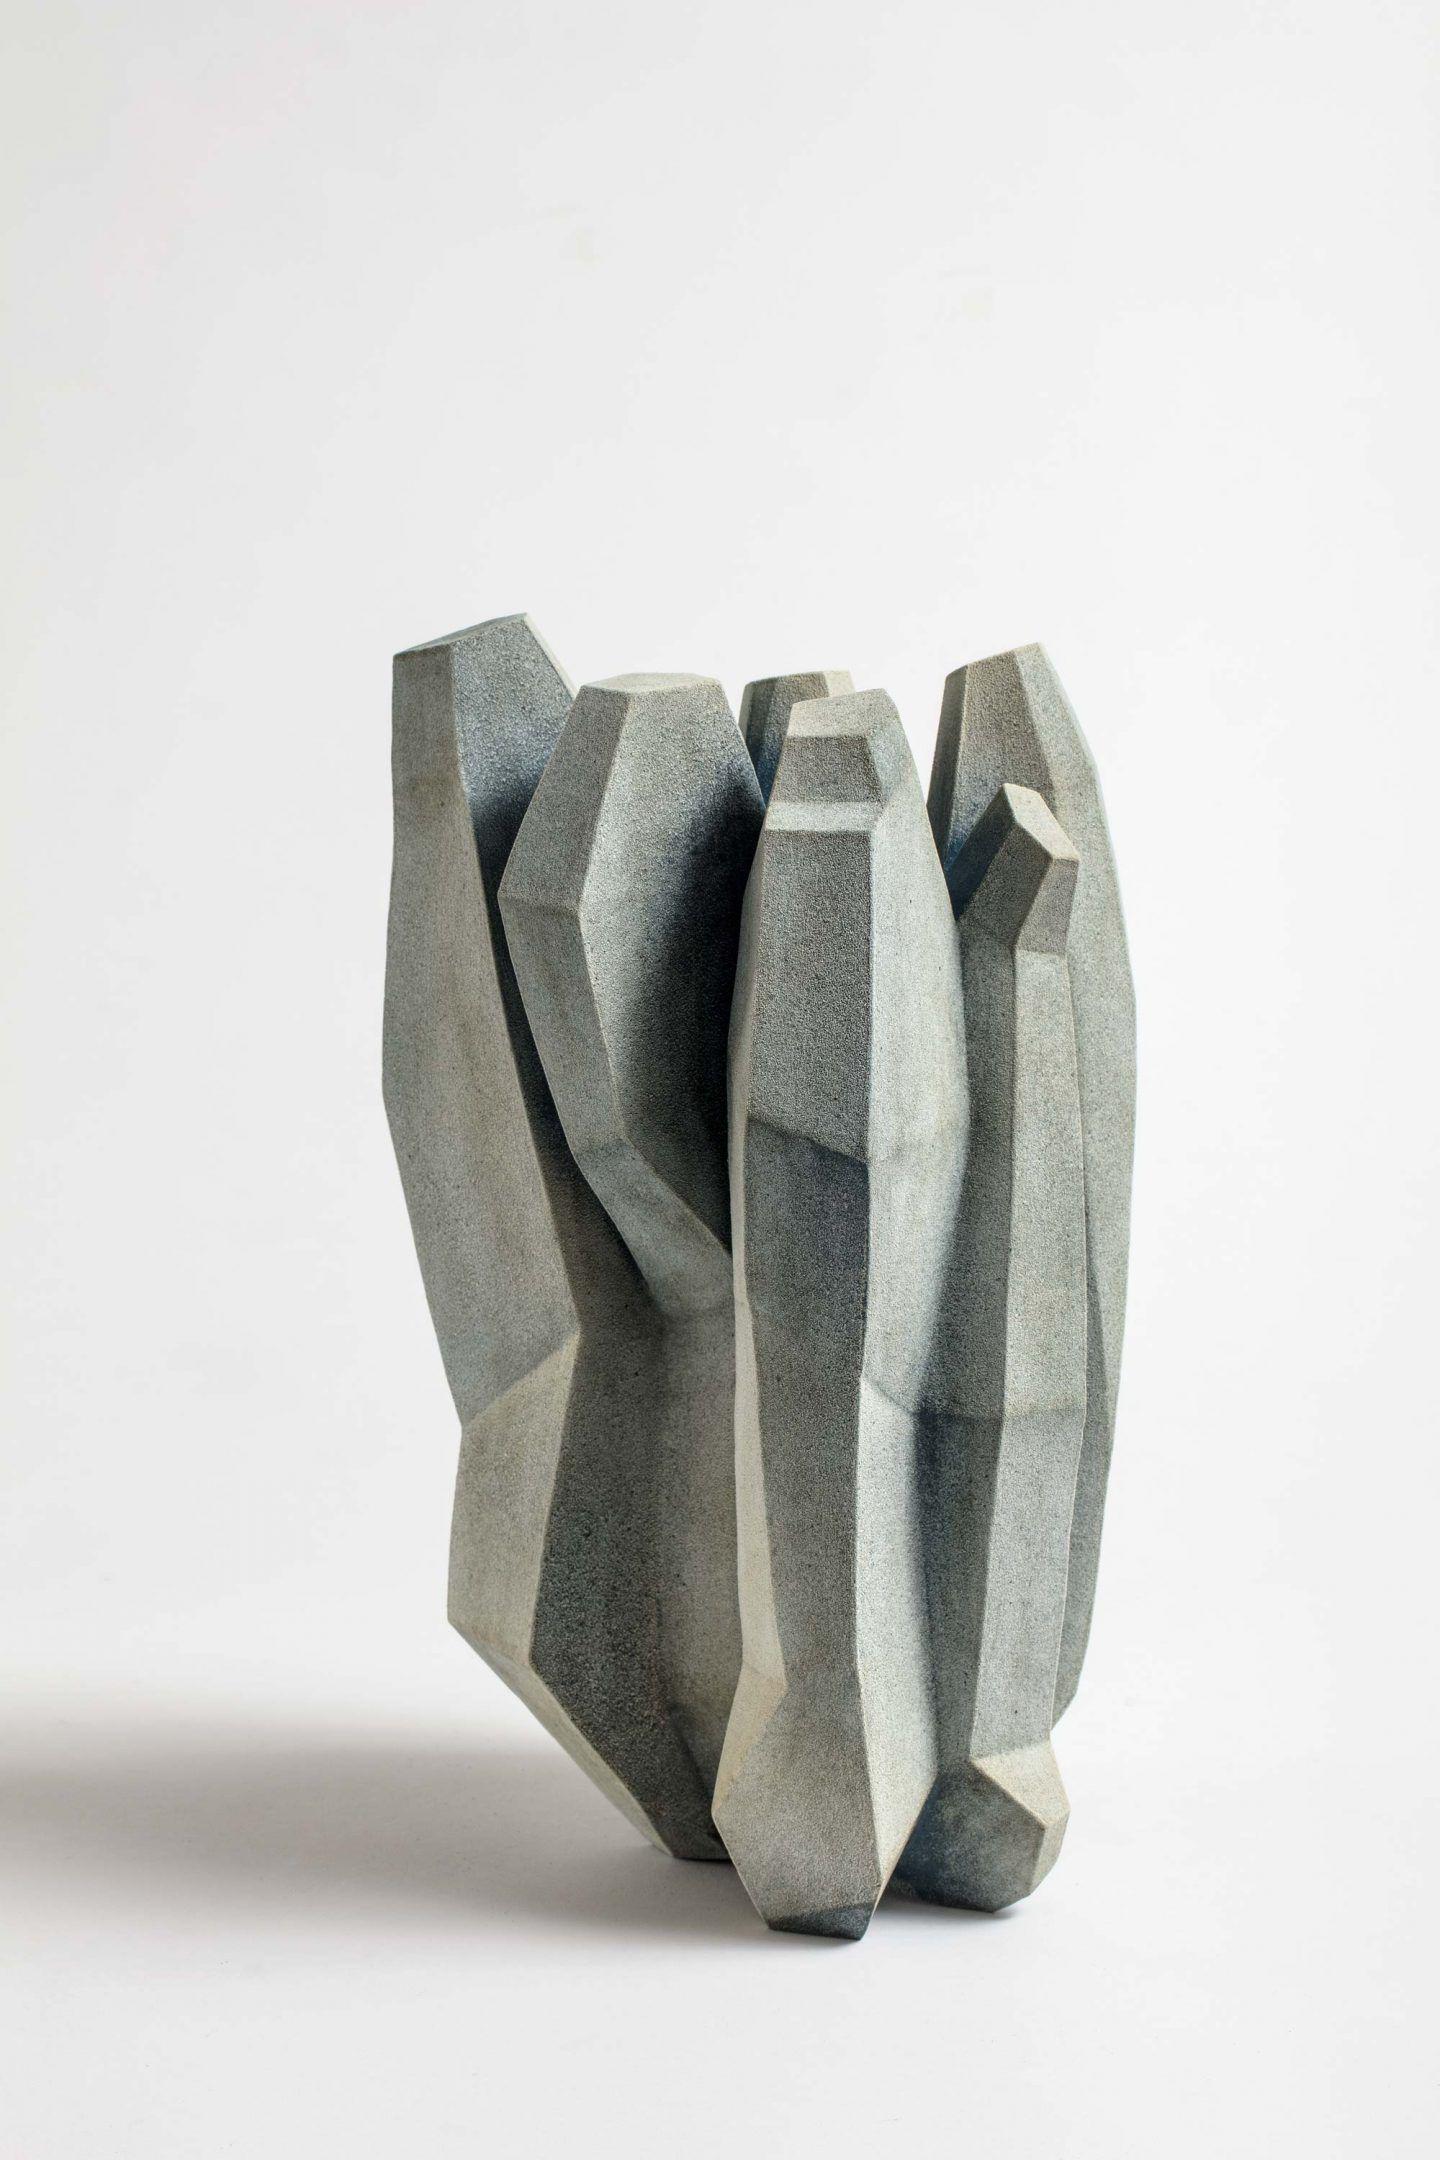 IGNANT-Design-Turi-Heisselberg-New-01